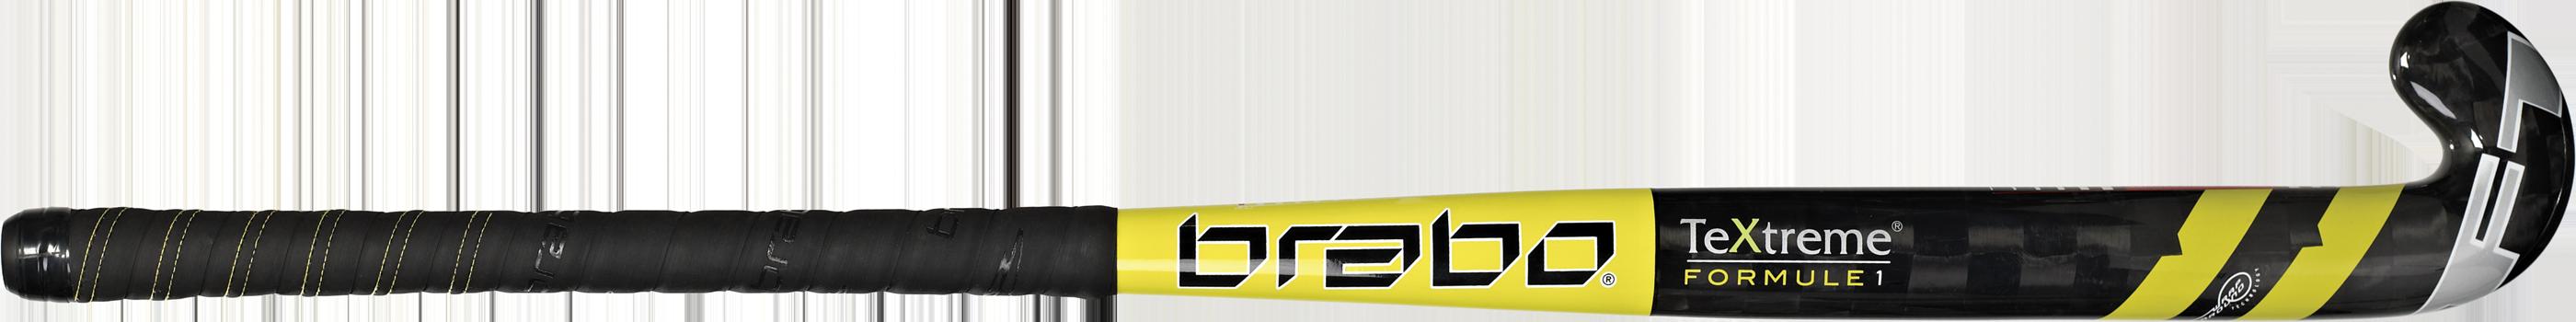 Netherlands based Kubus Sport is utilizing TeXtreme® Spread Tow